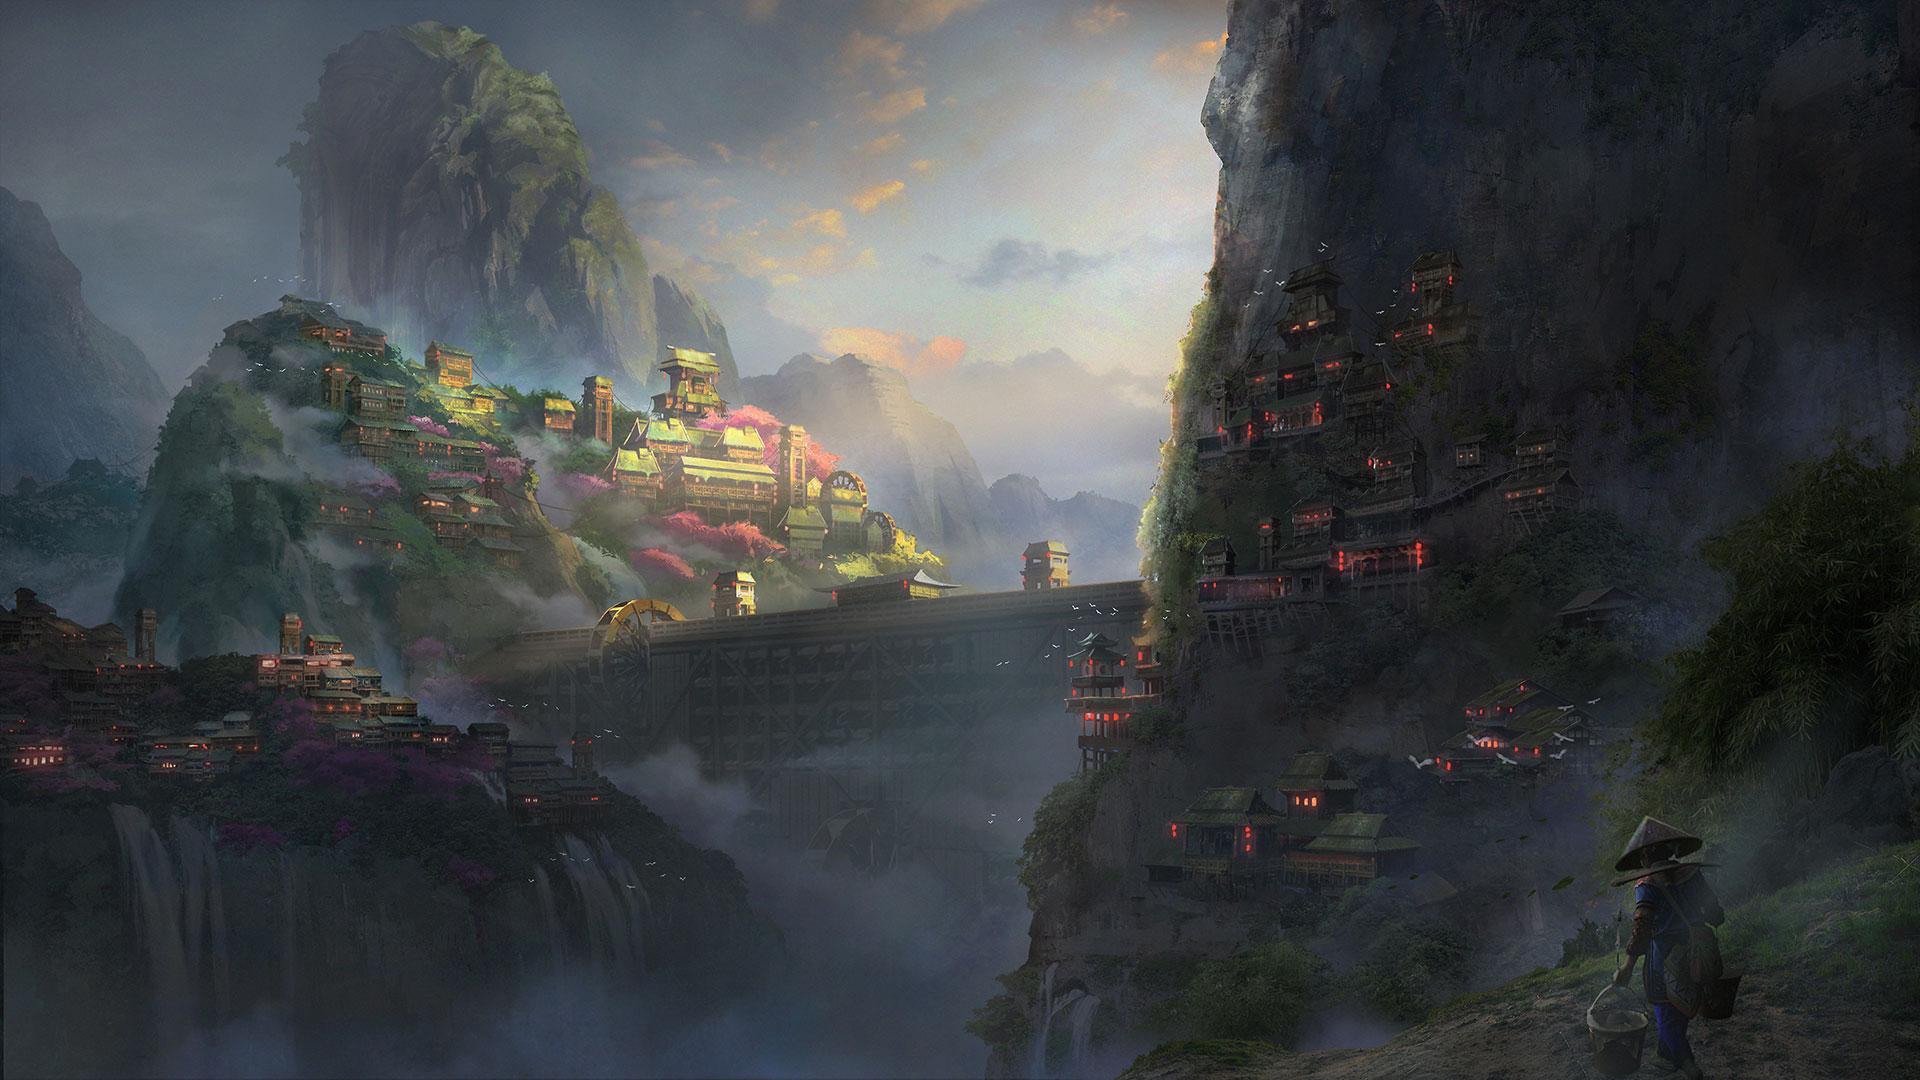 """Spark More""王者荣耀打造玩家新触点,让游戏焕活更多传统文化的可能"